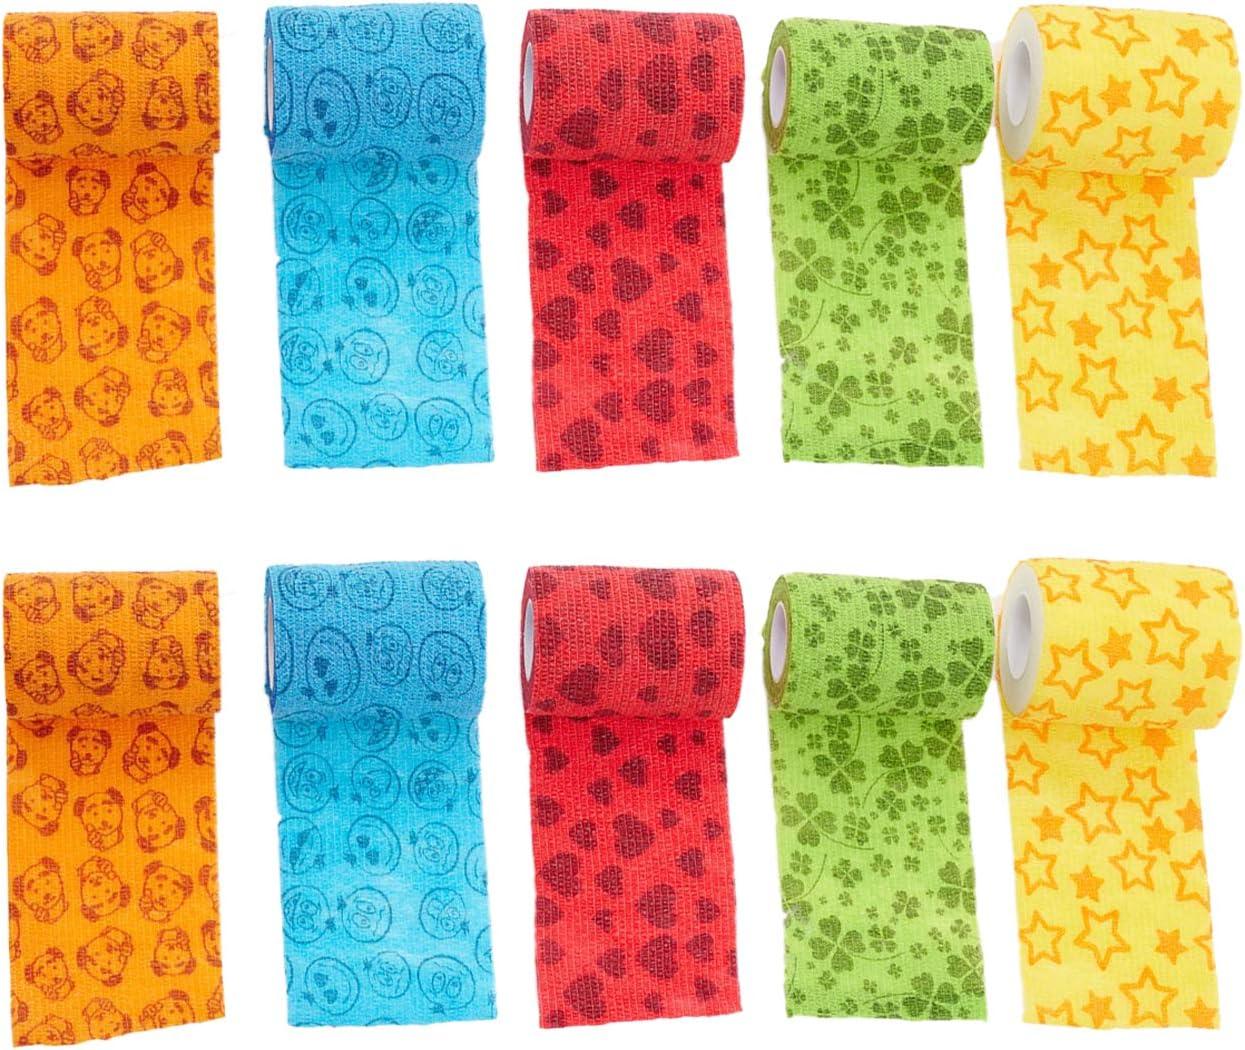 Safety and trust Kruuse Fun Flex Pet Care Bandage Assorted Kansas City Mall Patterns